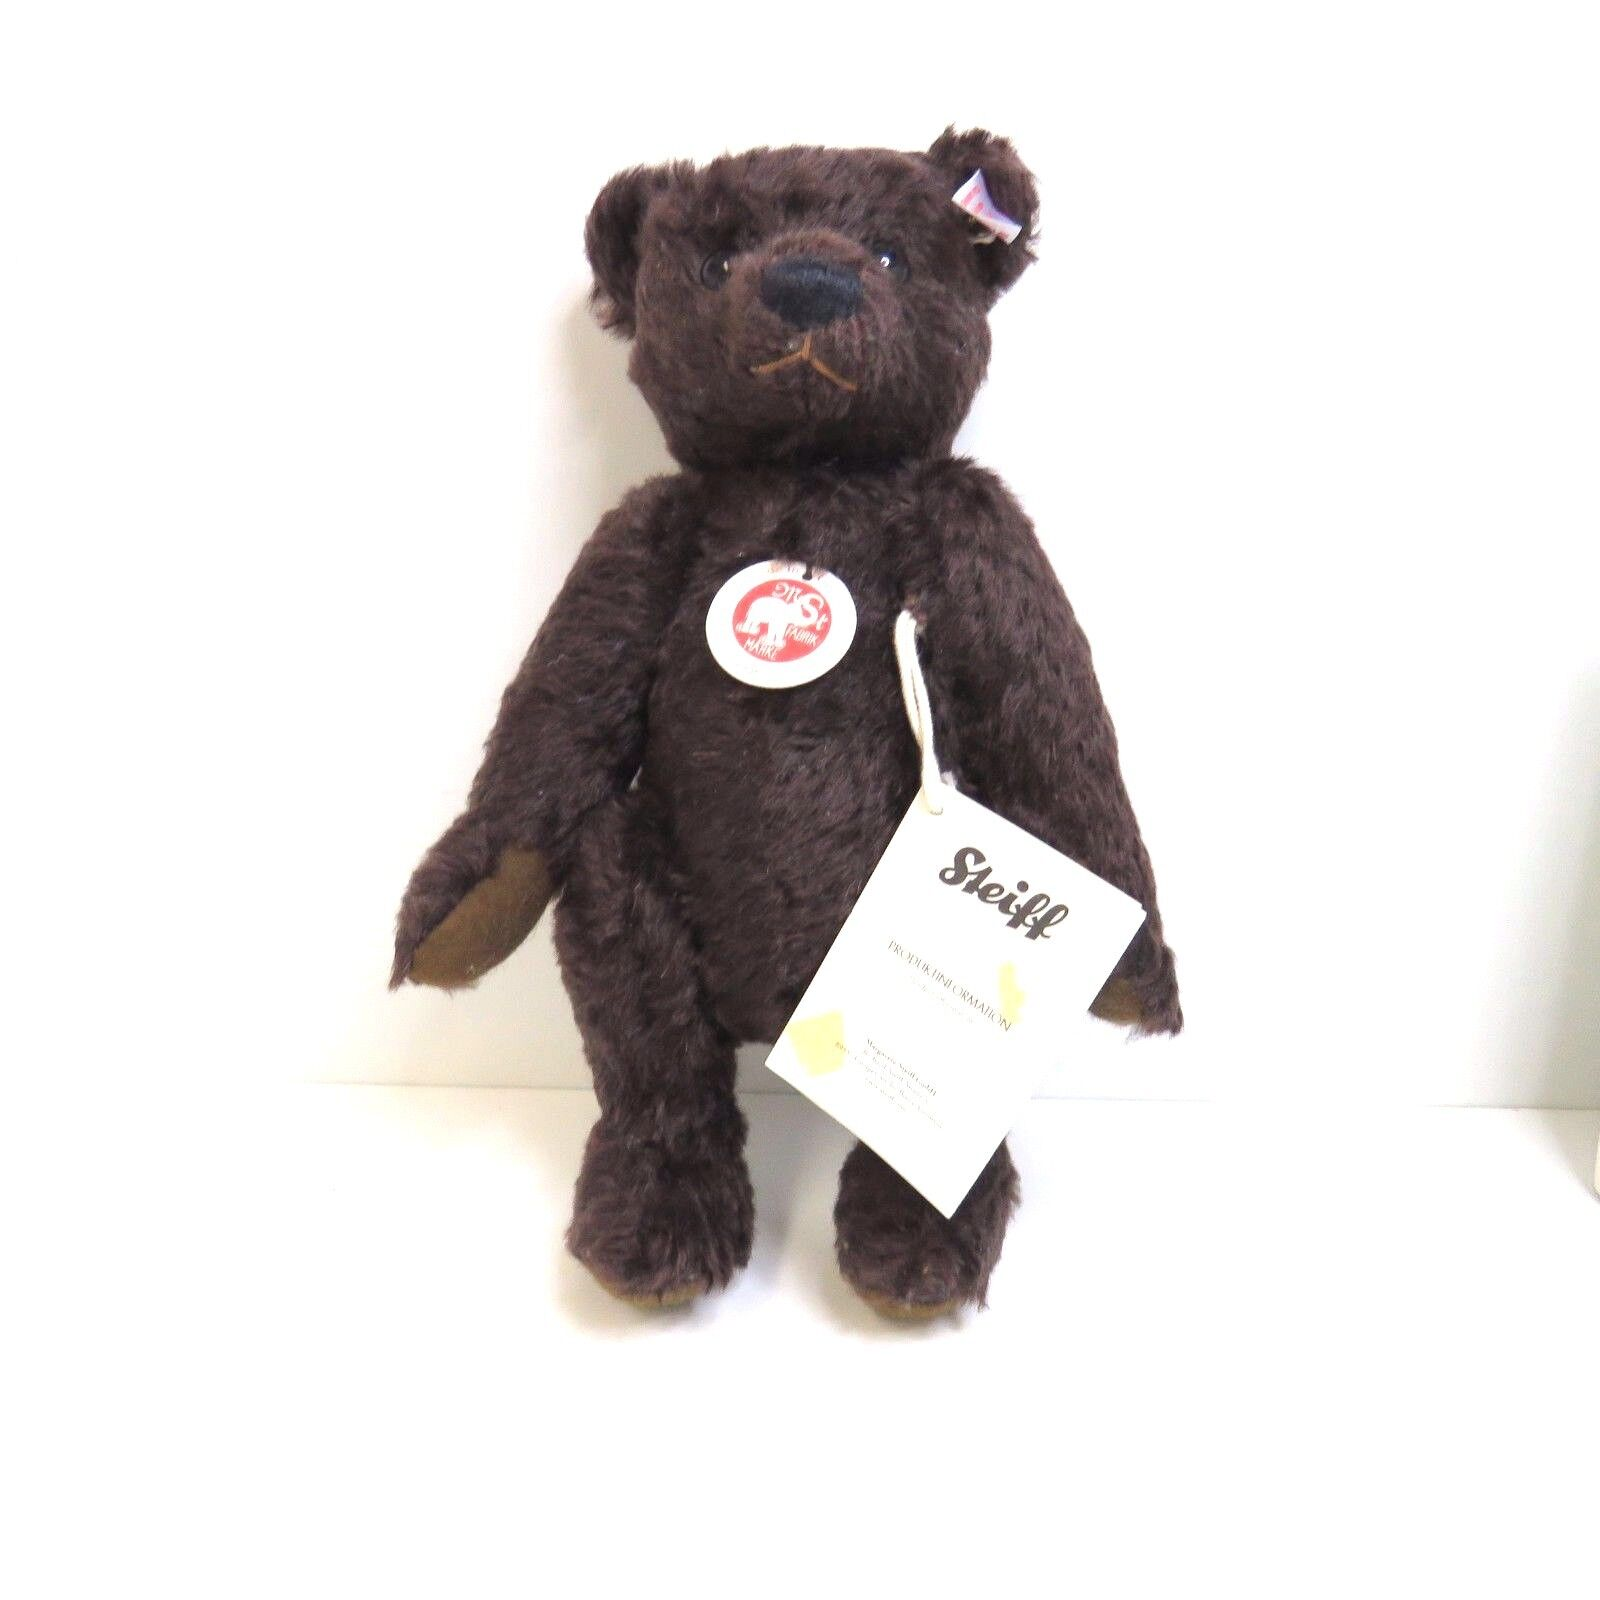 Teddybär 26 Mohair dunkelbraun Steiff  036293 NEUWARE